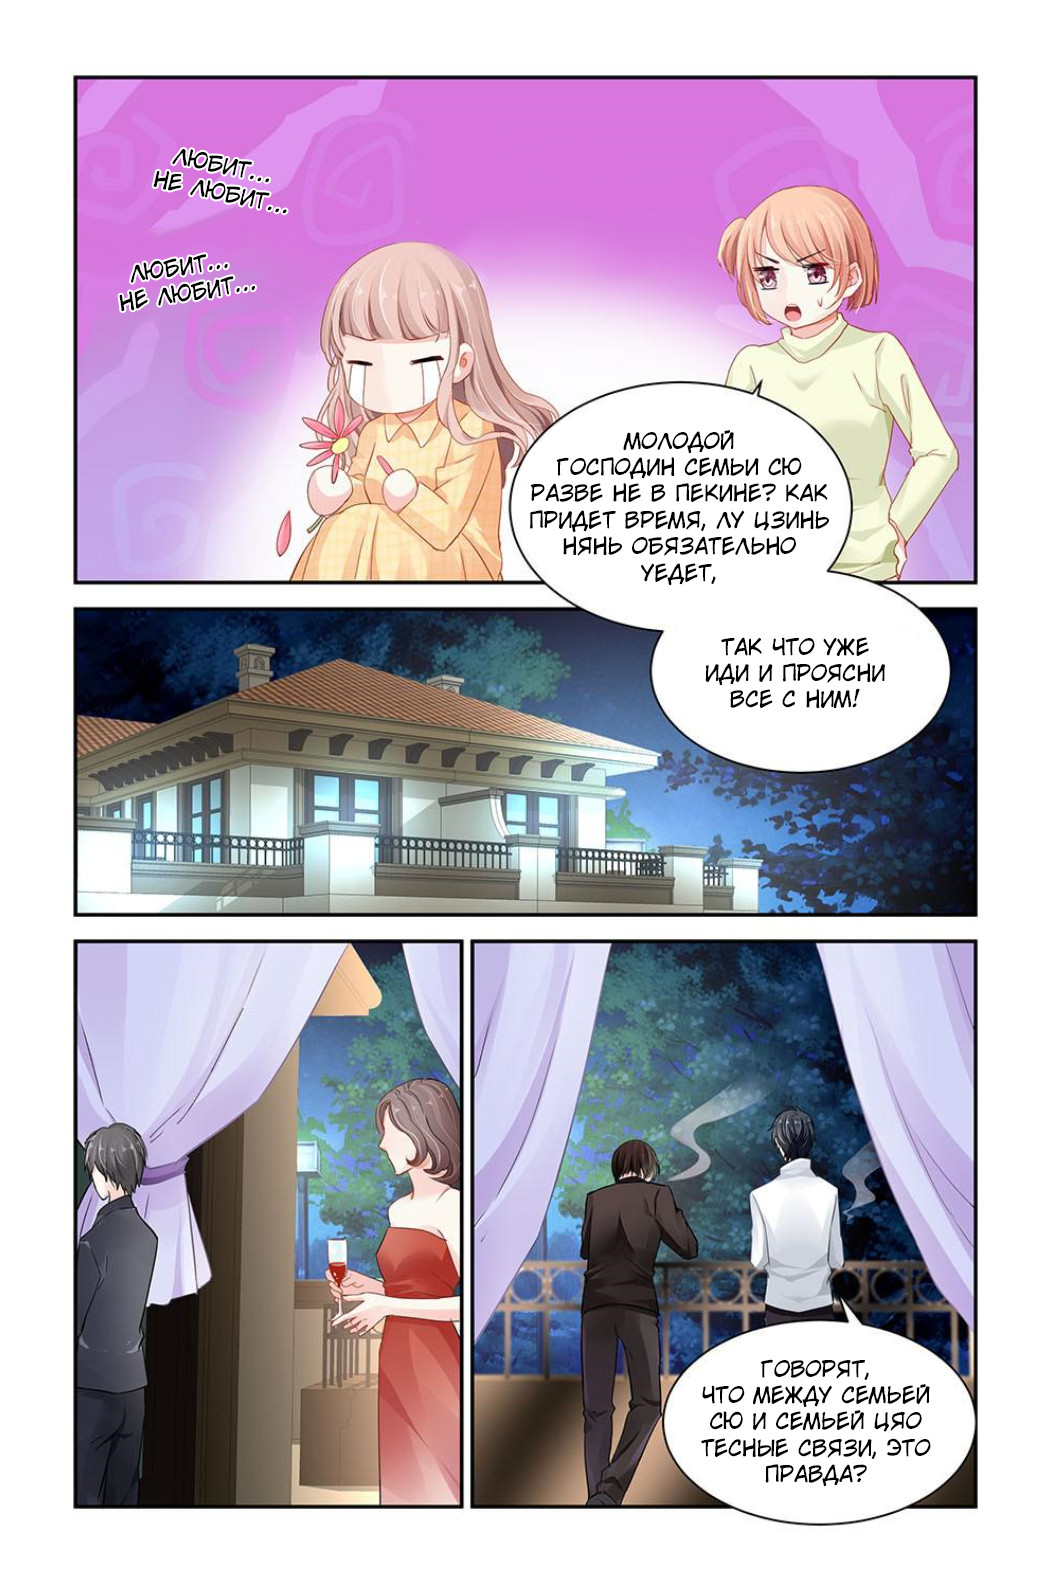 https://r1.ninemanga.com/comics/pic2/14/27598/284692/1455510336314.jpg Page 3